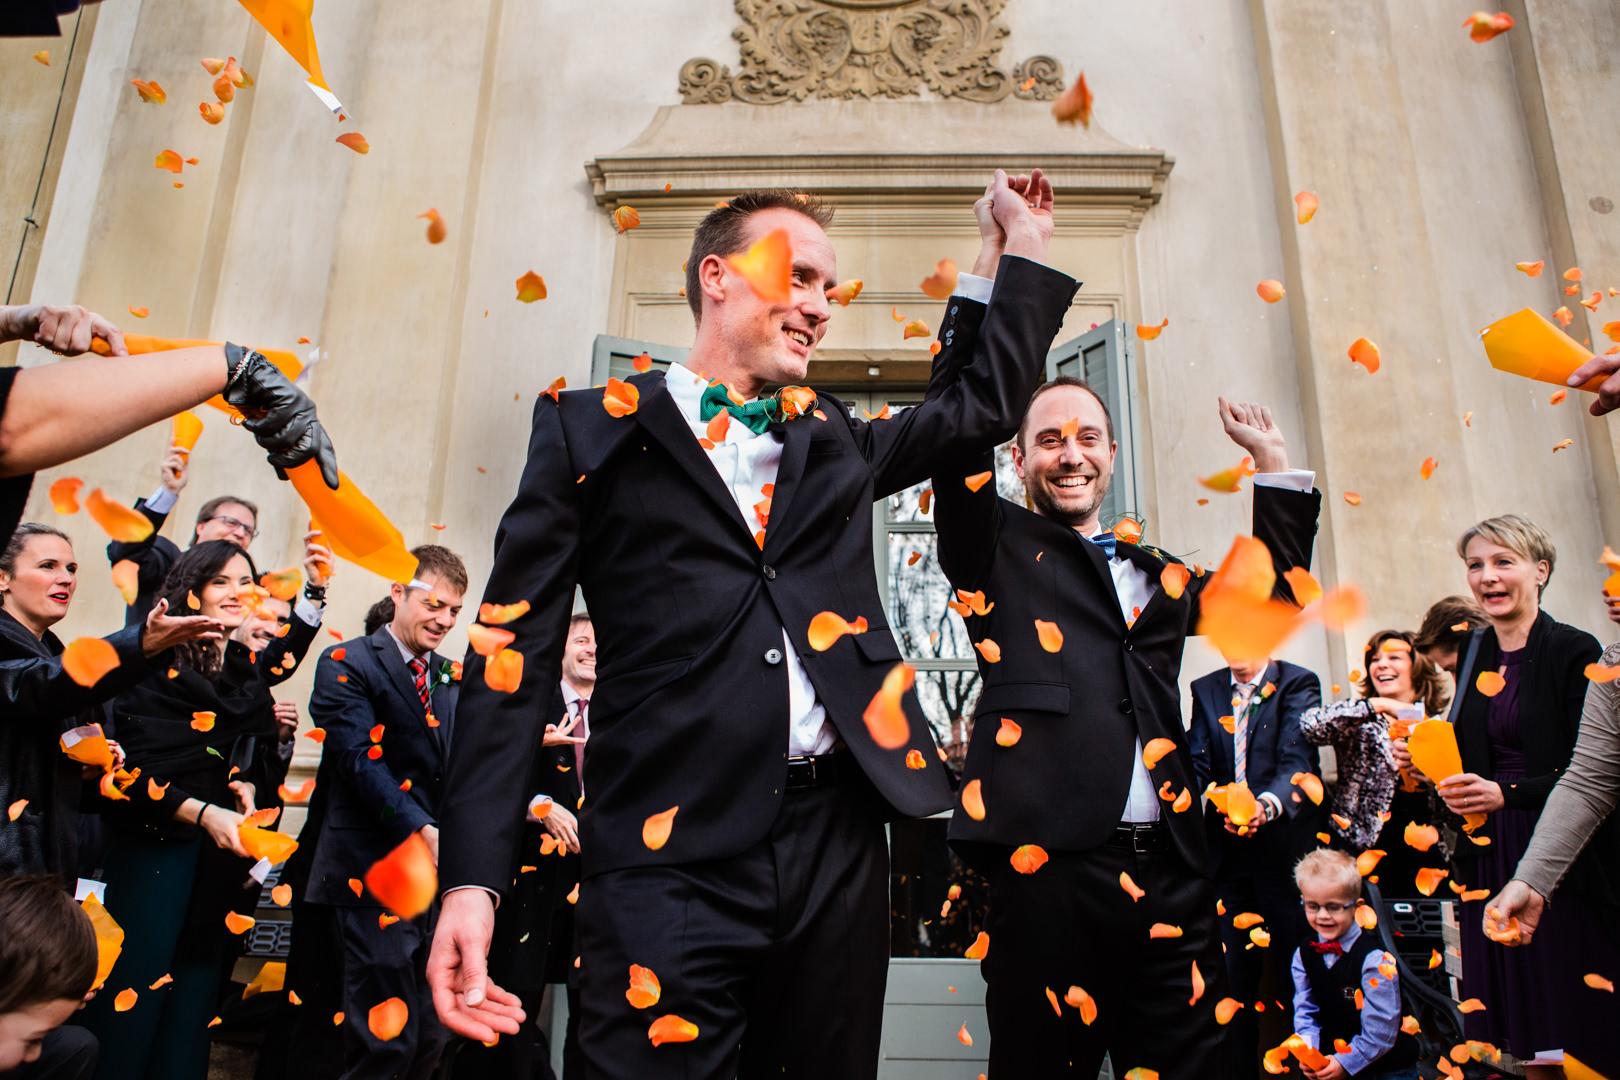 Same-sex-wedding-barcelona-boda- gay-samesex-engagement-Rafael-Torres-fotografo-bodas-sevilla-madrid-barcelona-wedding-photographer--22.jpg